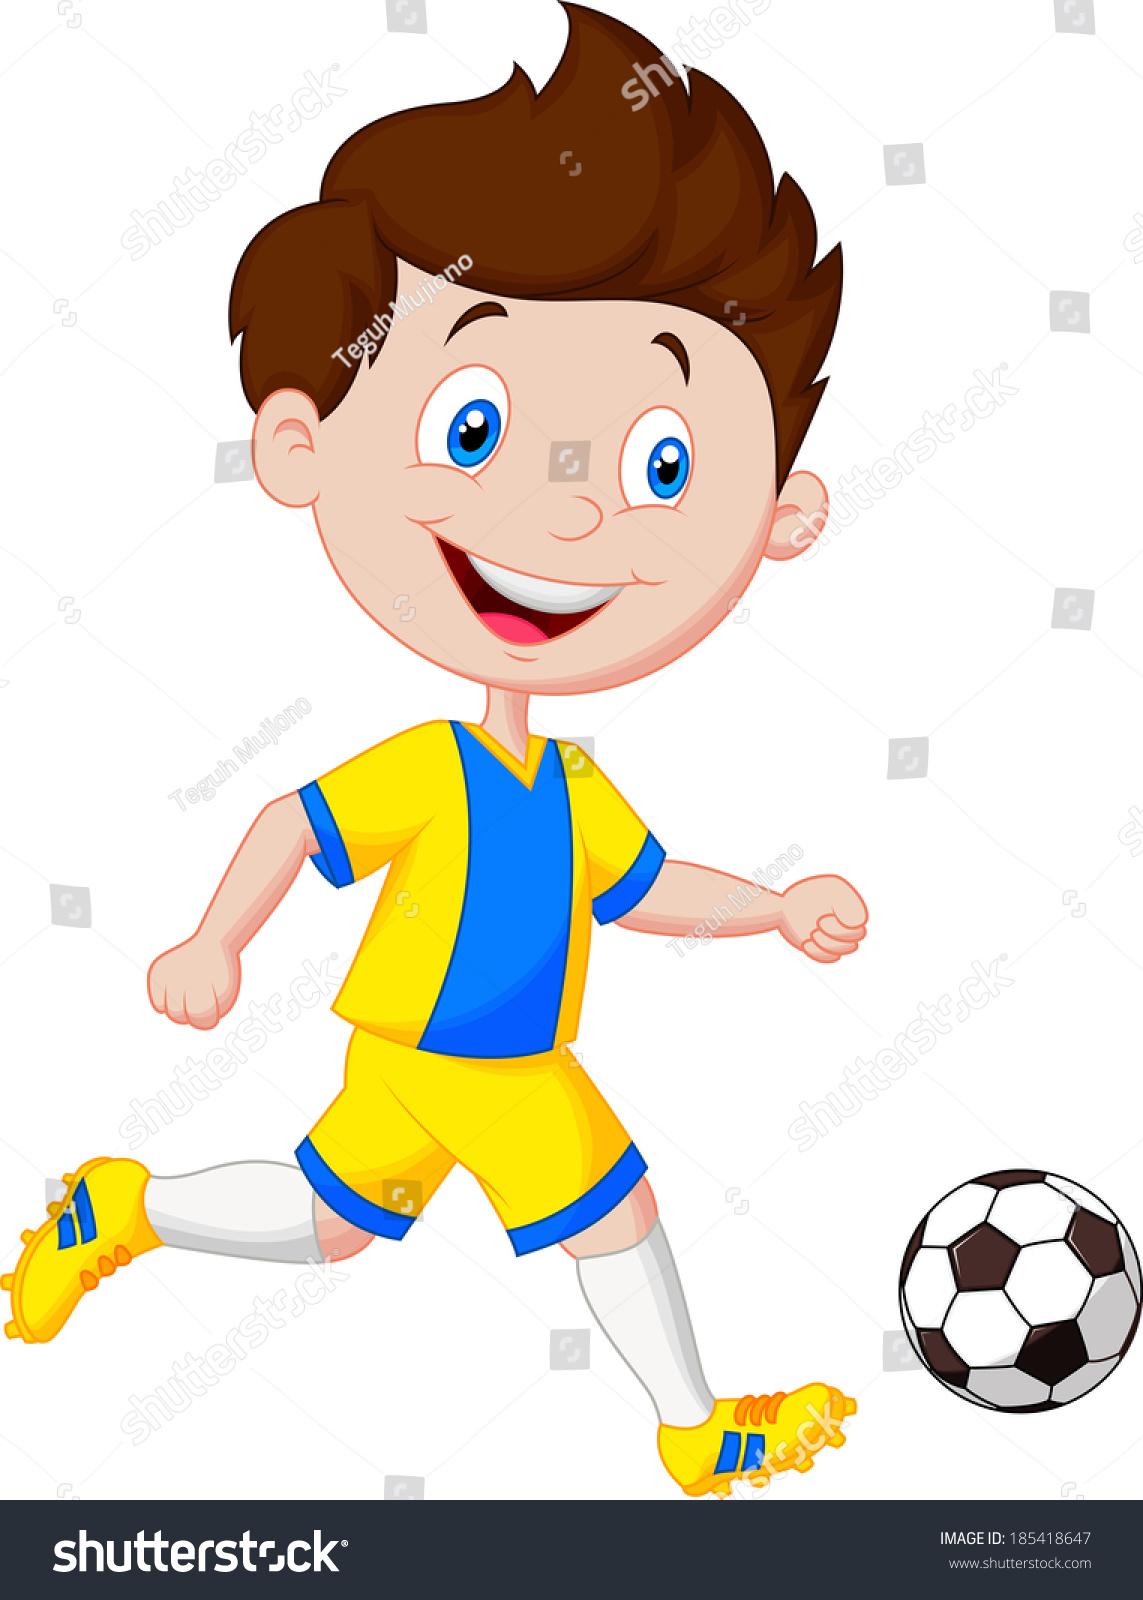 Cartoon Boy Playing Football Stock Vector 185418647 - Shutterstock